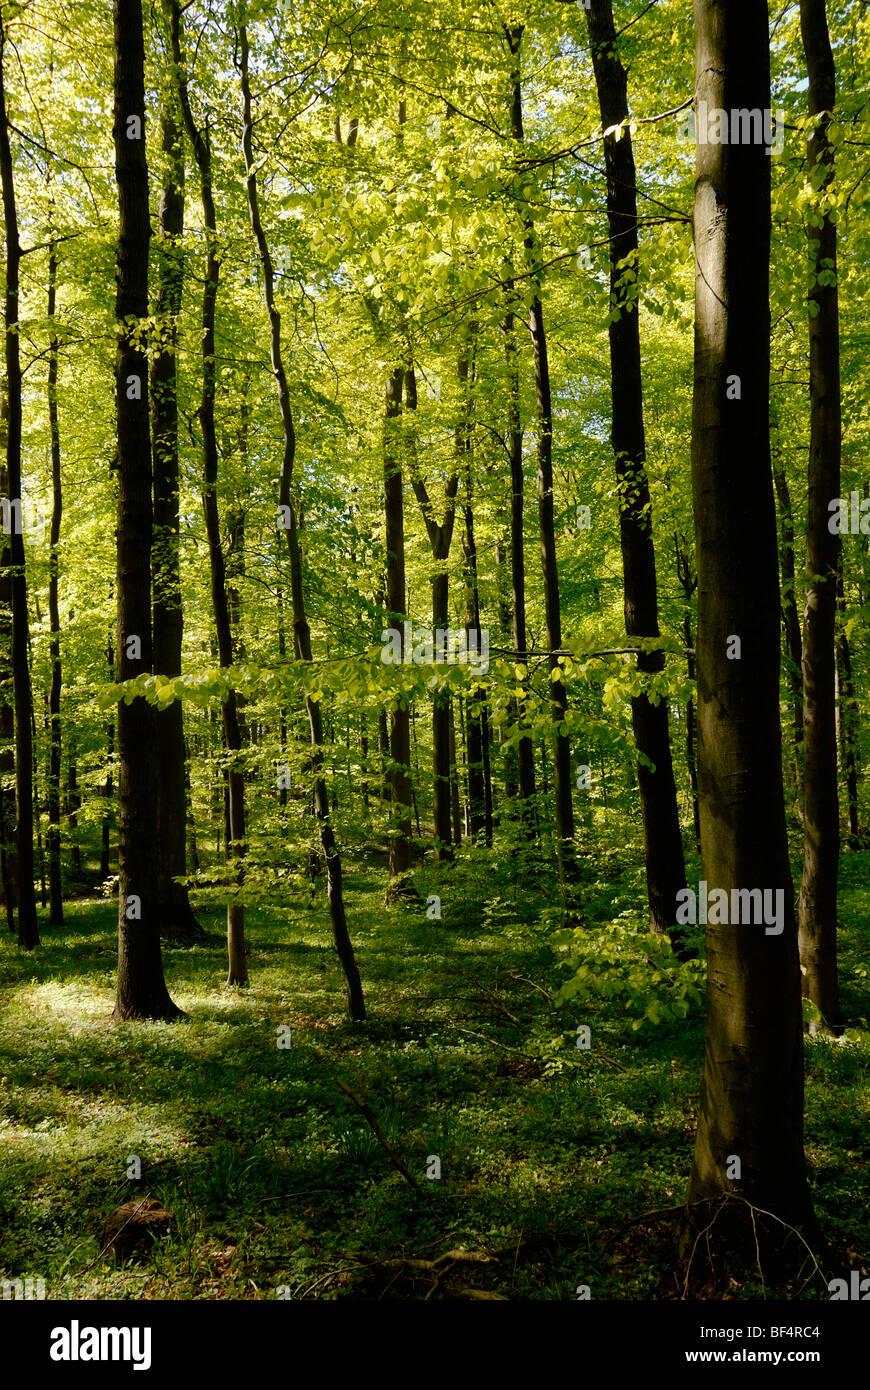 Spring in a Hornbeam (Carpinus betulus) forest Stock Photo